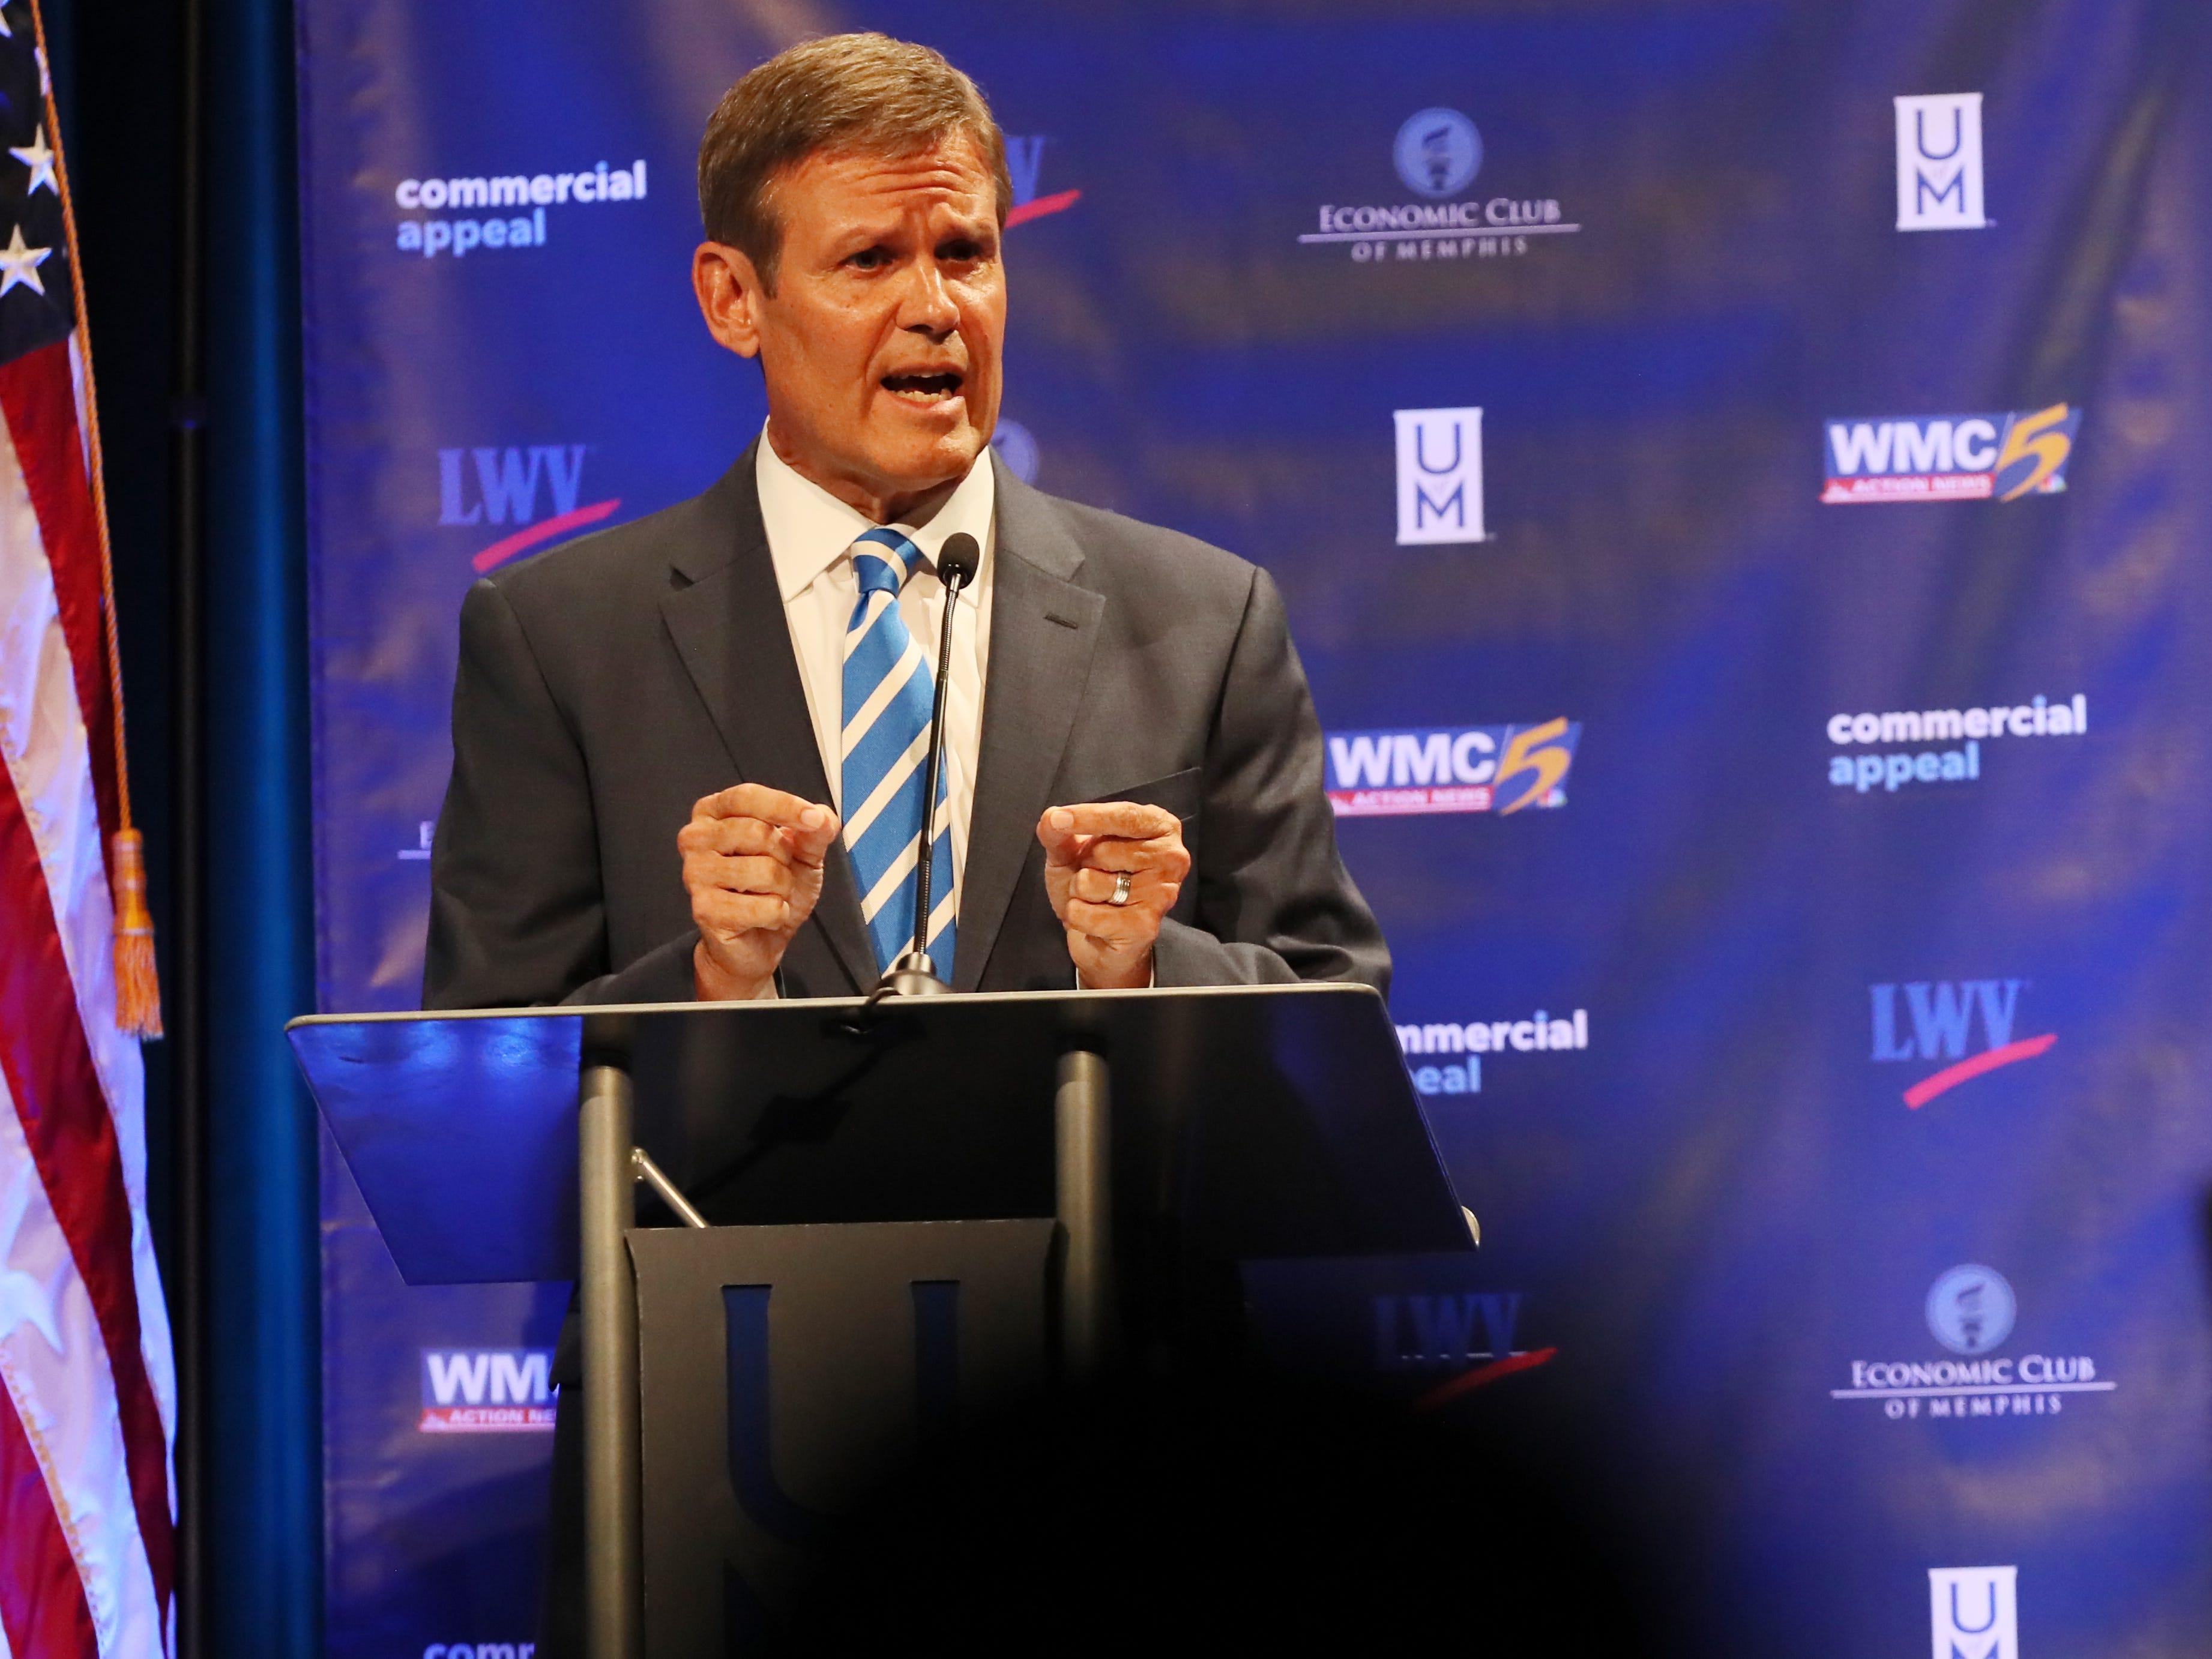 Republican Bill Lee speaks during the gubernatorial debate at the University of Memphis' Michael D. Rose Theater in Memphis, Tenn., on Tuesday, Oct. 2, 2018.